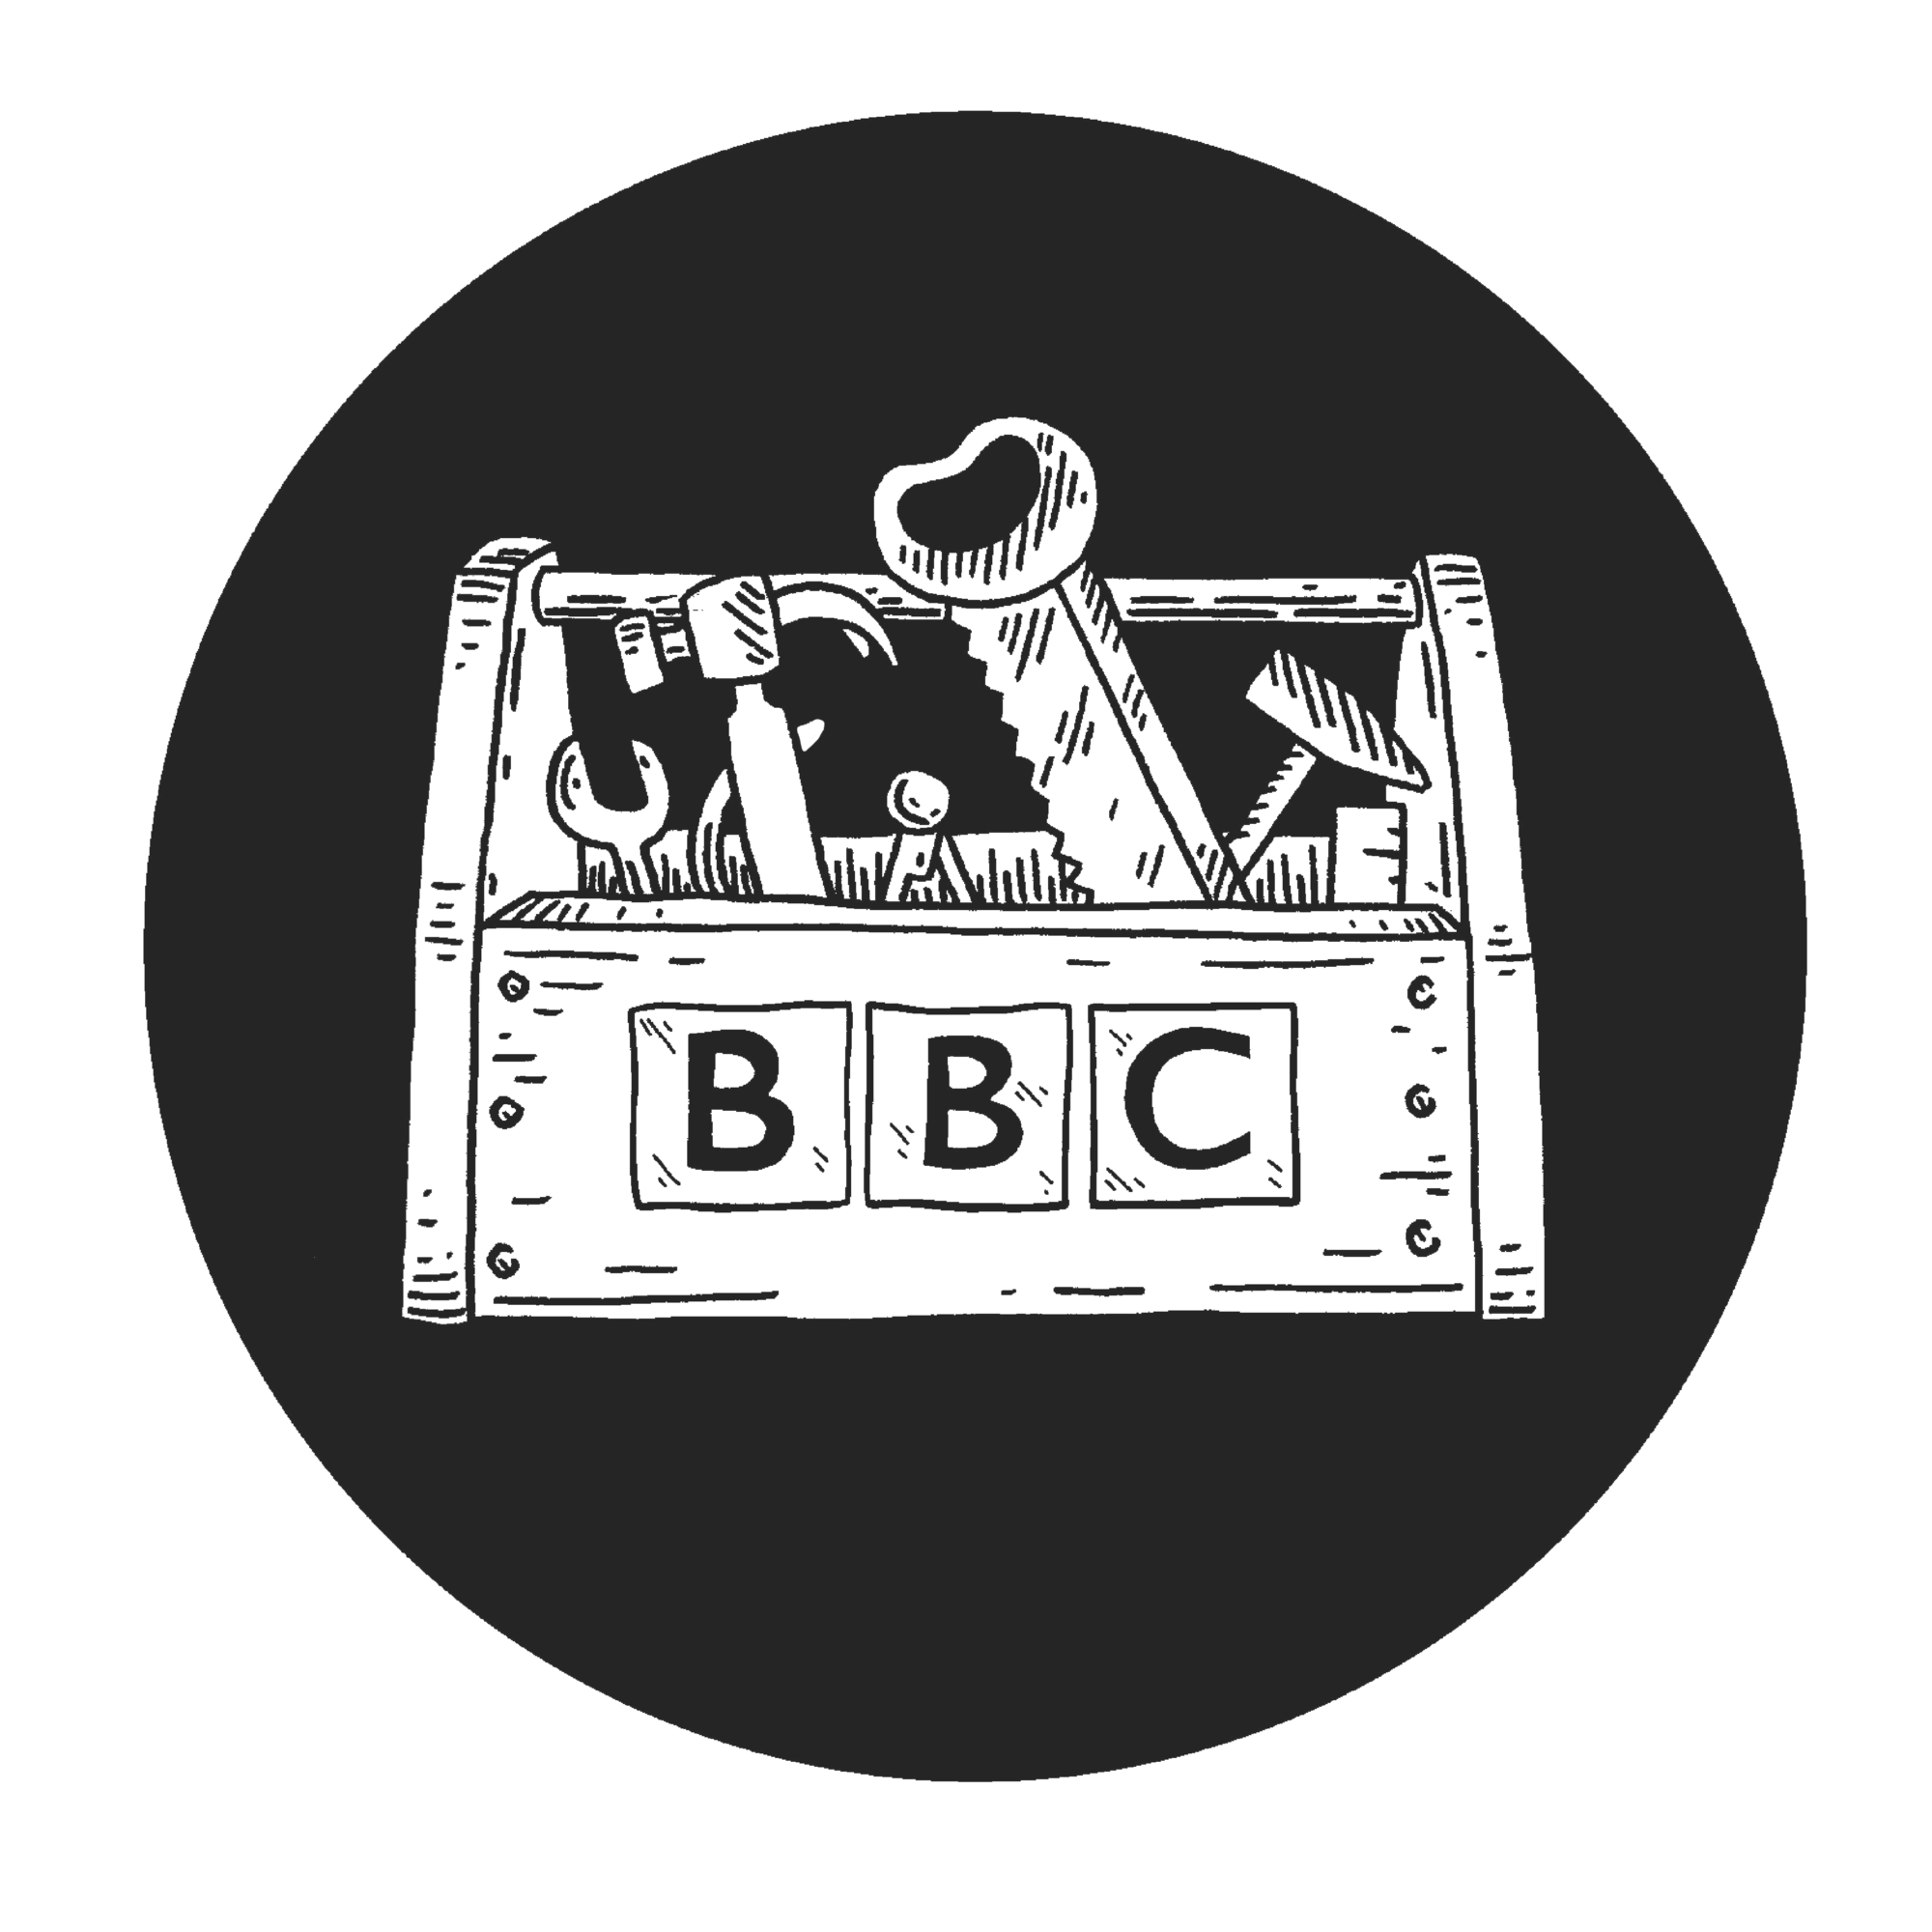 BBC-Toolbox